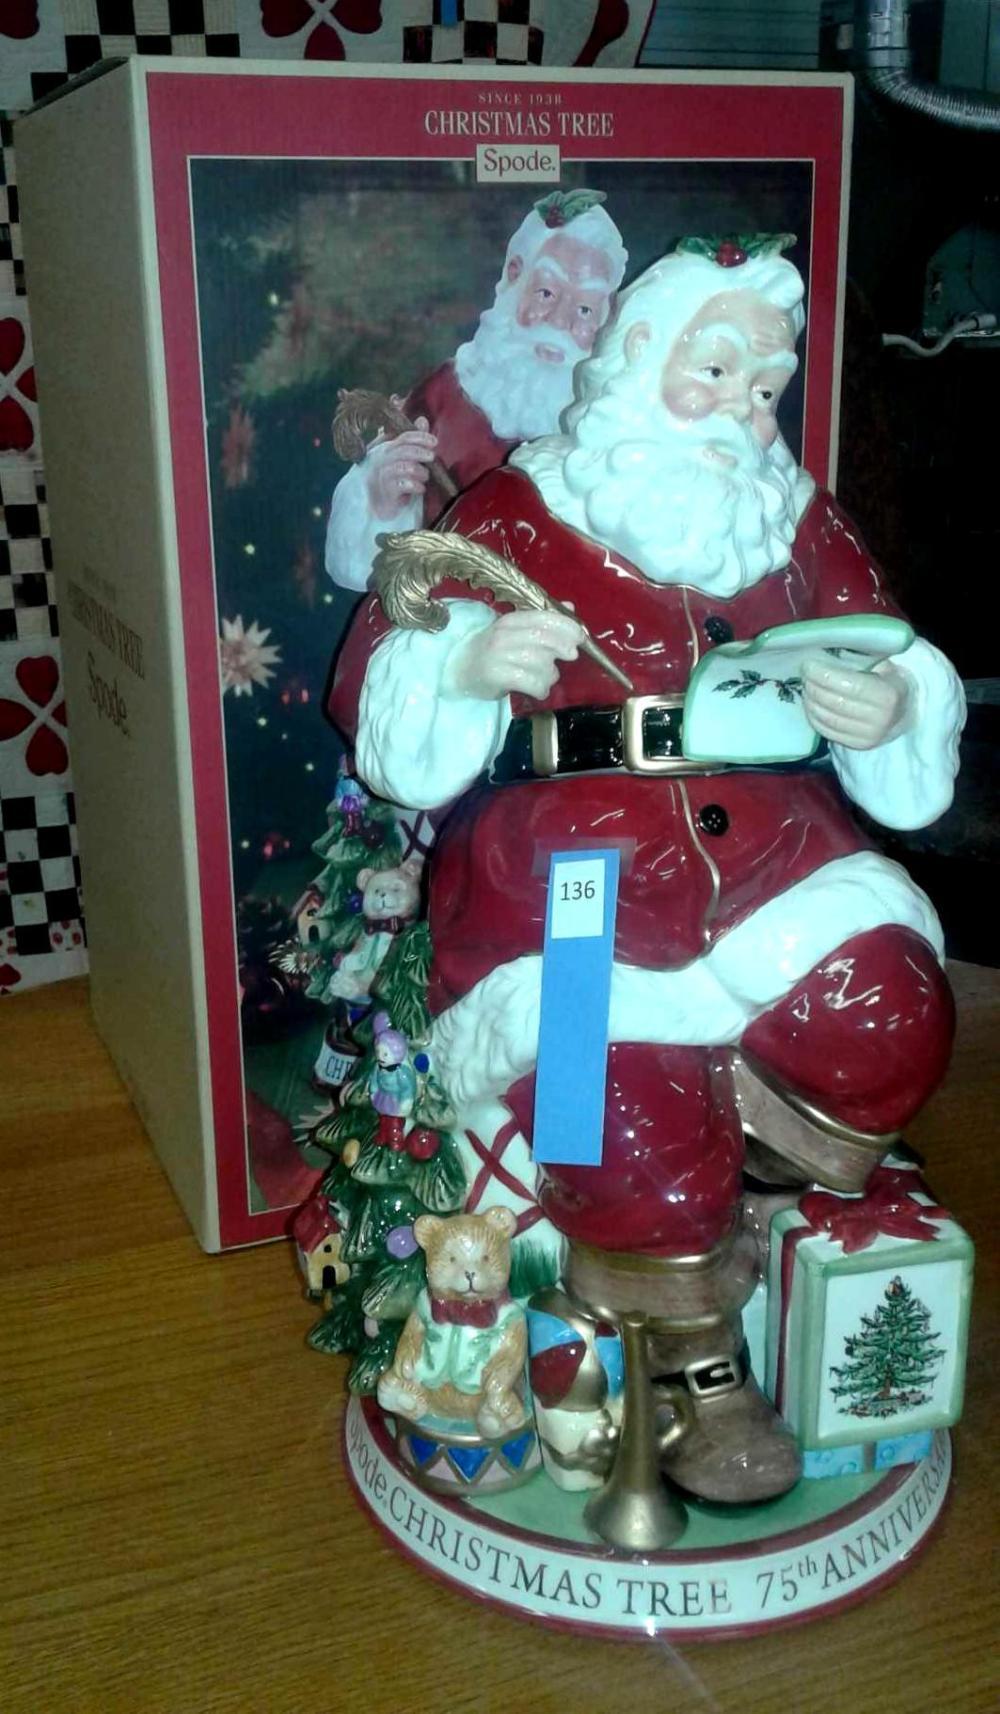 SPODE CHRISTMAS TREE 75TH ANNIVERSARY SANTA COOKIE JAR IN THE BOX